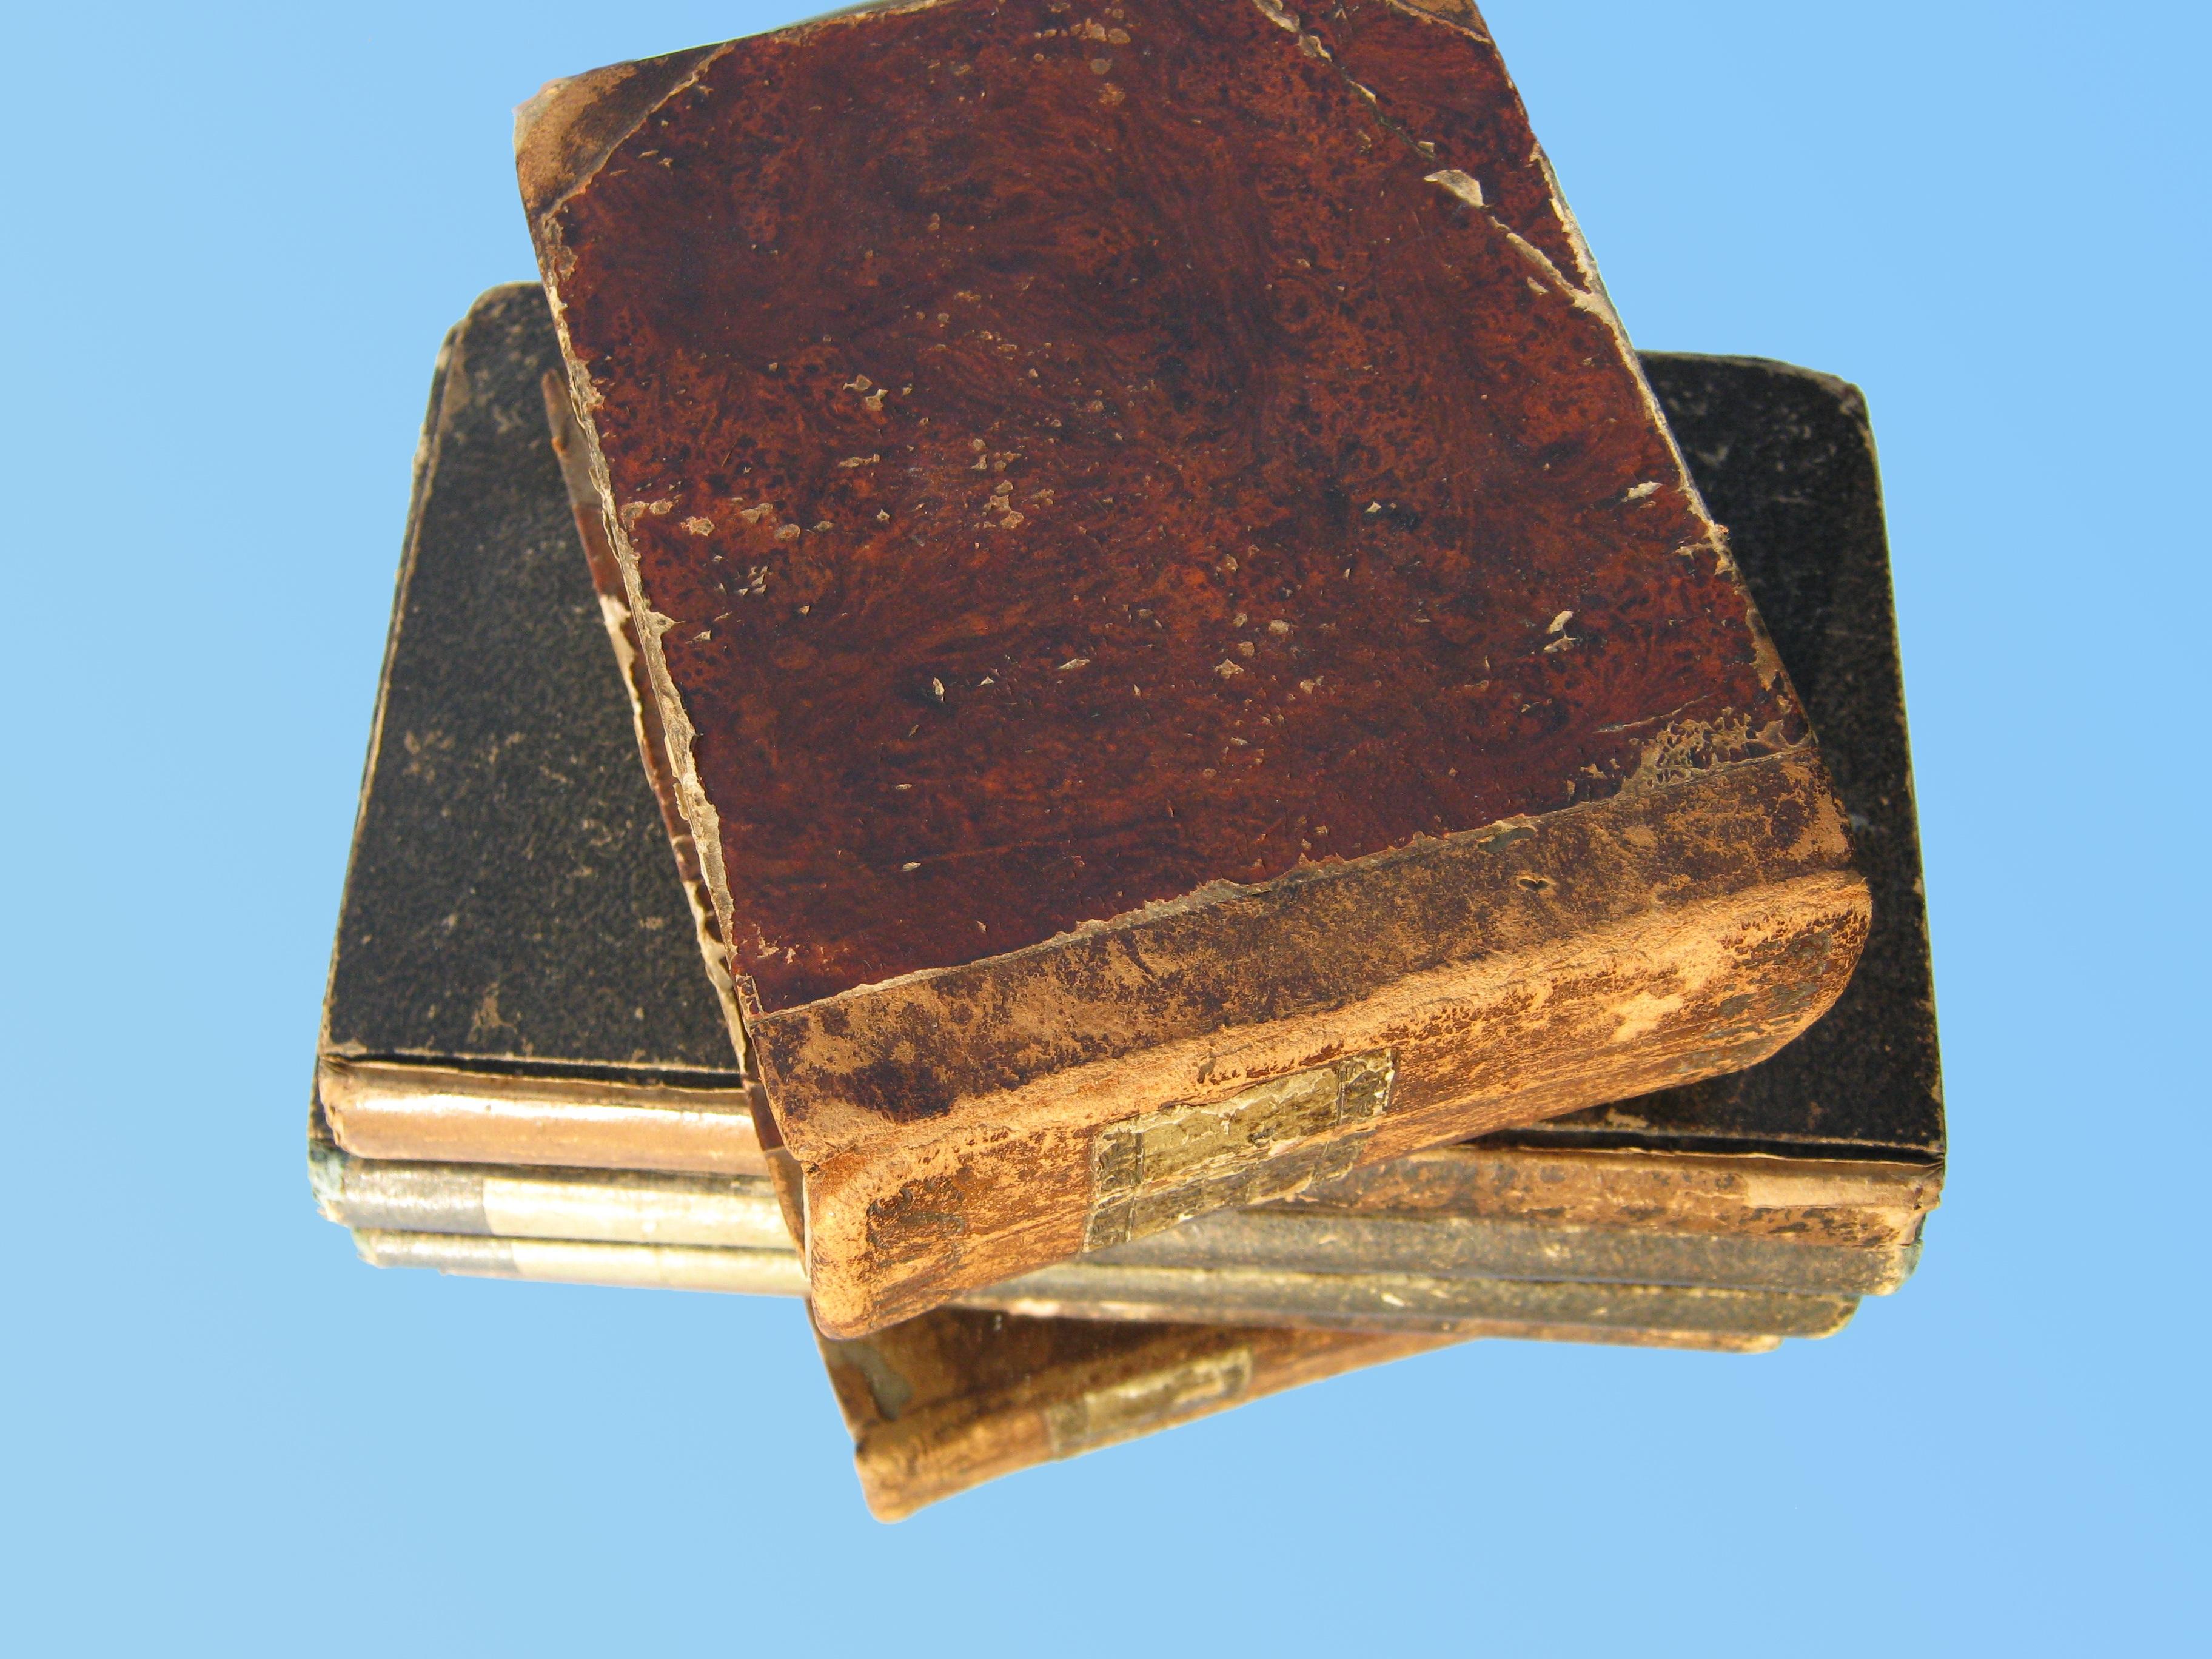 Libro leer madera antiguo retro antiguo material anticuario libros usados